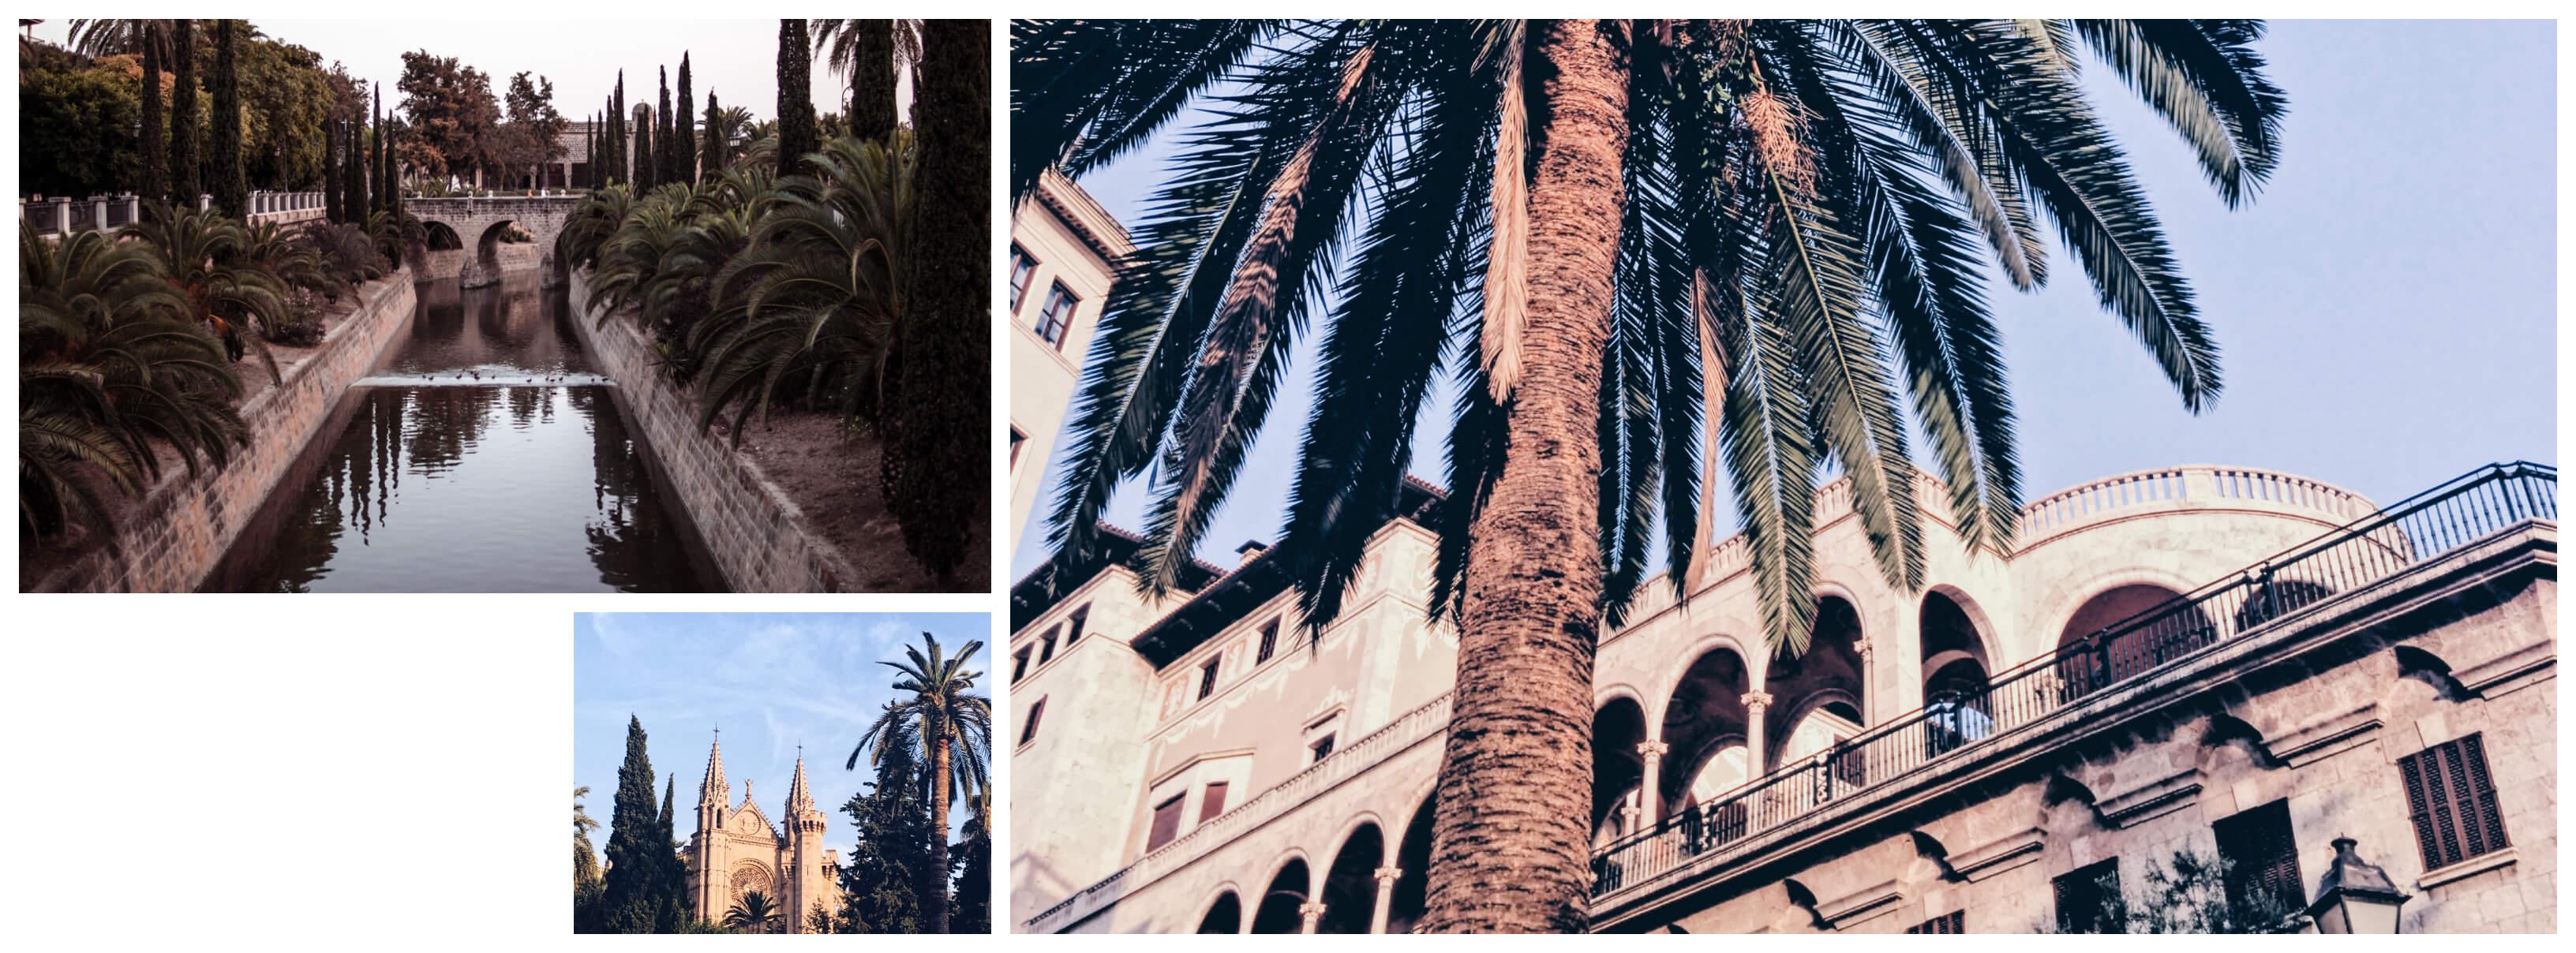 Altstadt Palma de Mallorca Reisetipps